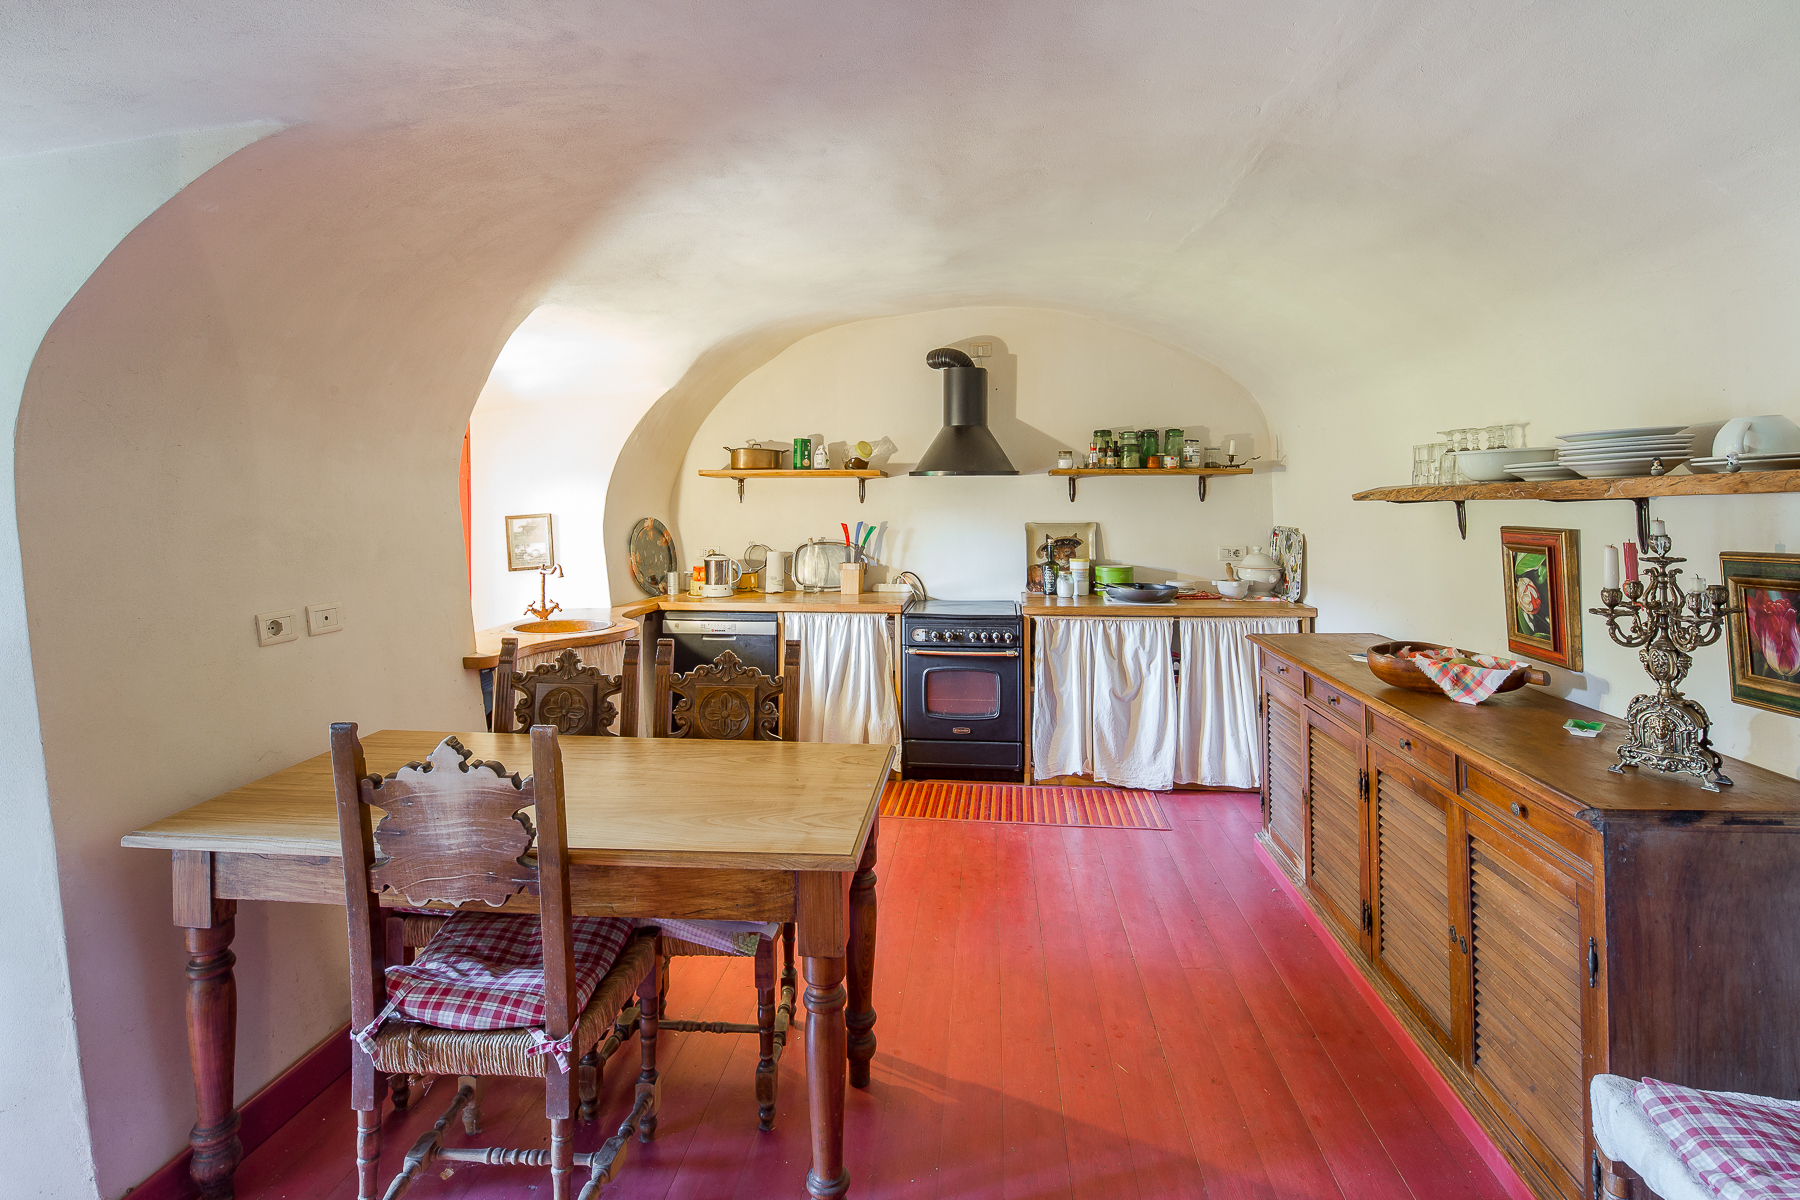 Casa indipendente in Vendita a Caprino Bergamasco: 5 locali, 500 mq - Foto 5